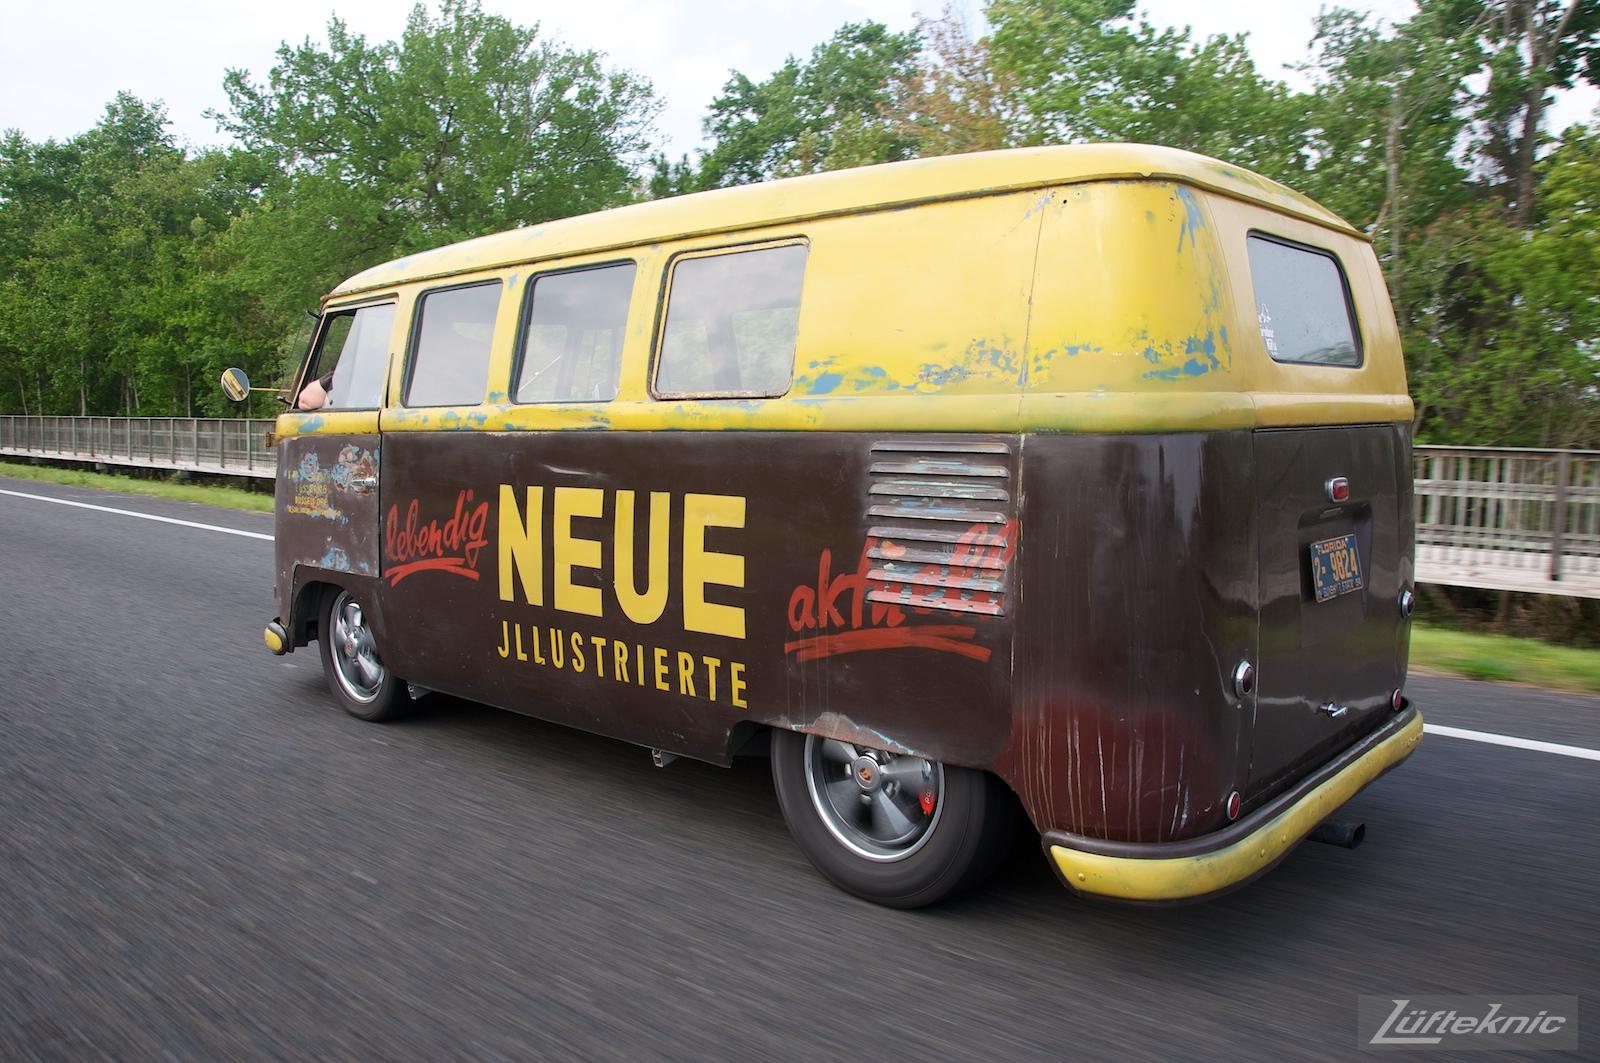 Barn door VW Transporter Neue Illustrierte